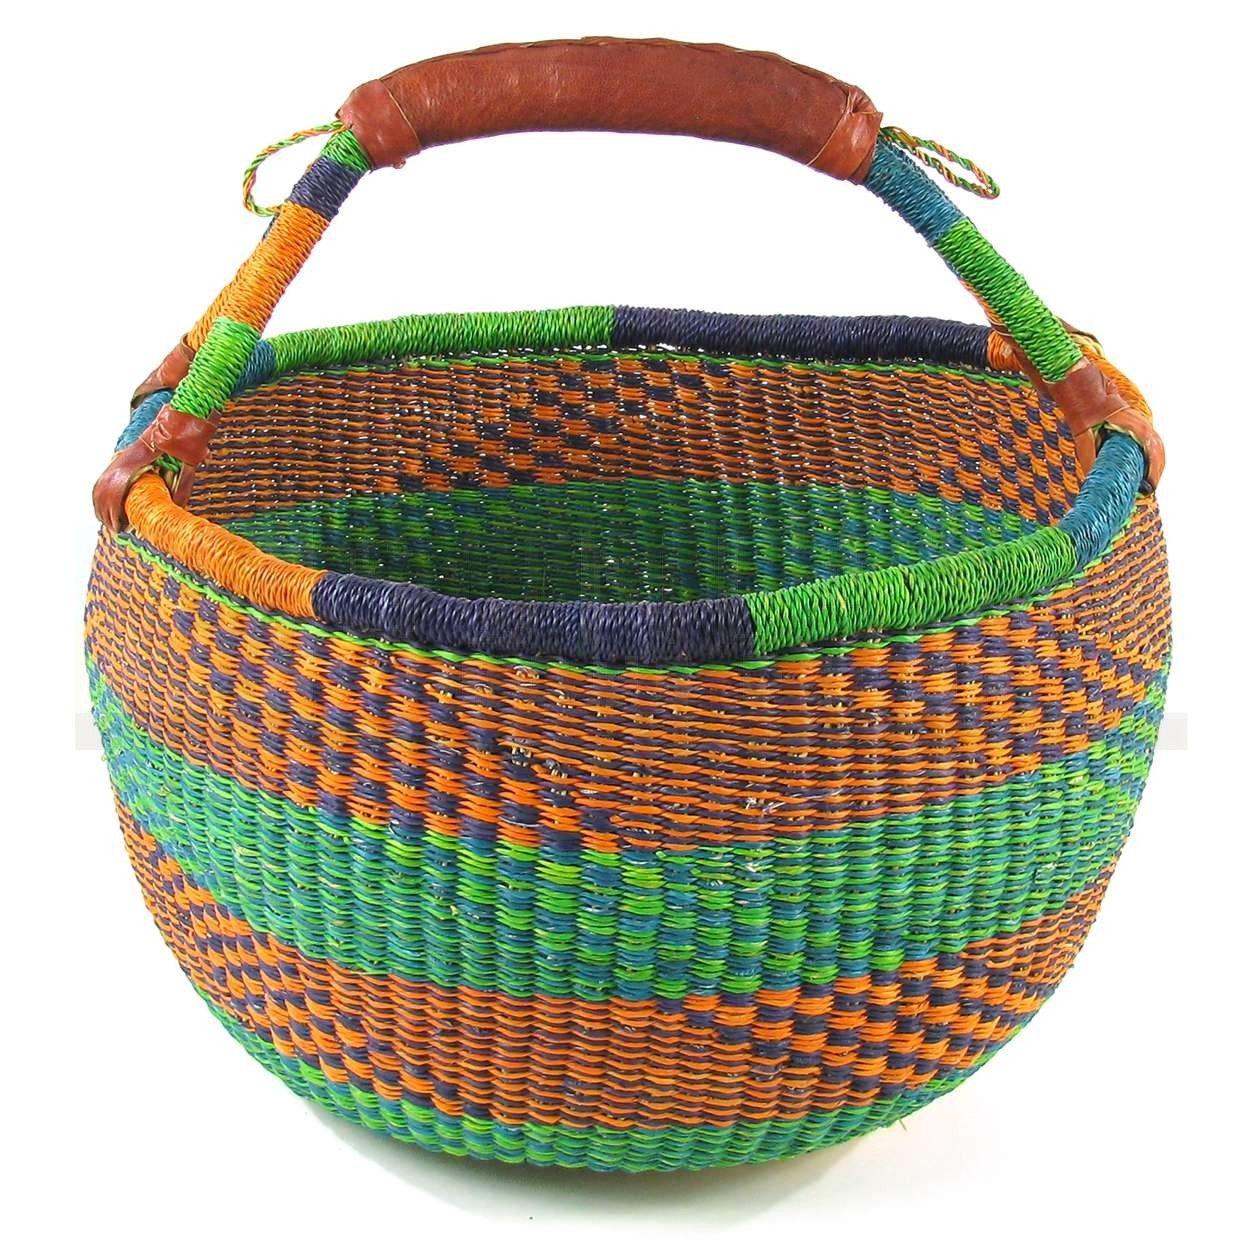 Most Inspiring African Traditional Basket - d919d400b514f8879c6b849b58230e44  Pic_485472.jpg